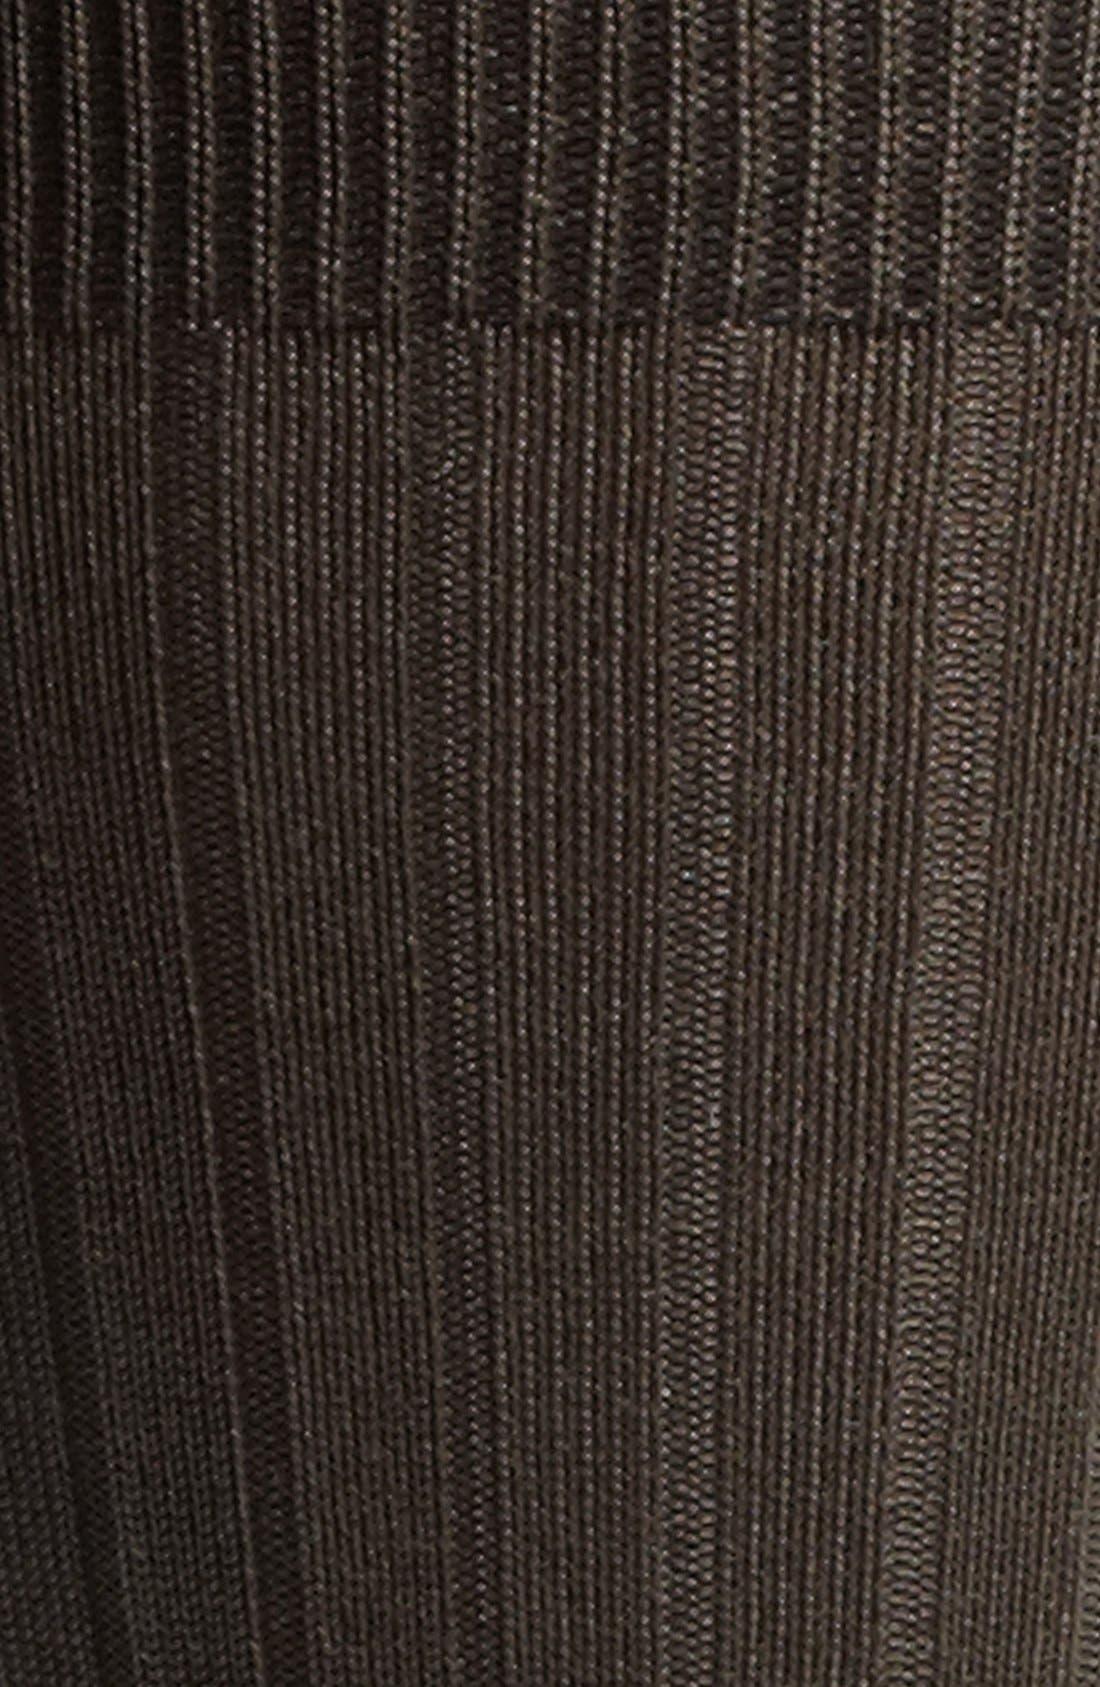 Cotton Blend Socks,                             Alternate thumbnail 2, color,                             Olive